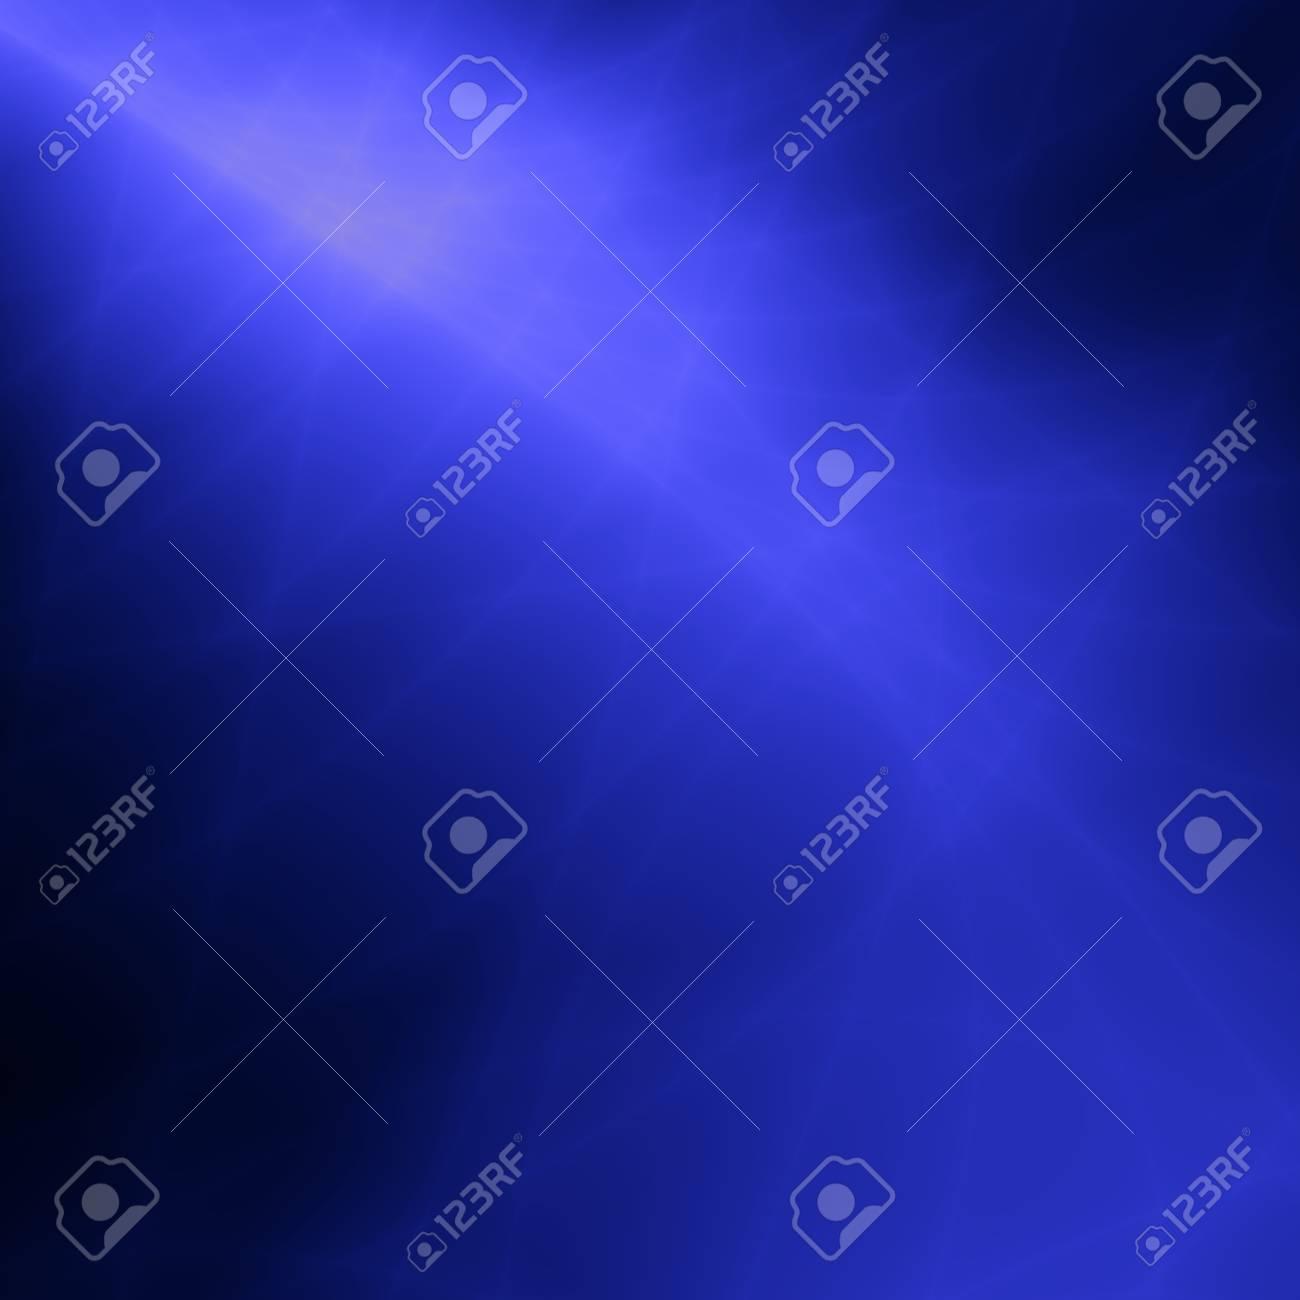 Free Bluebeam Templates